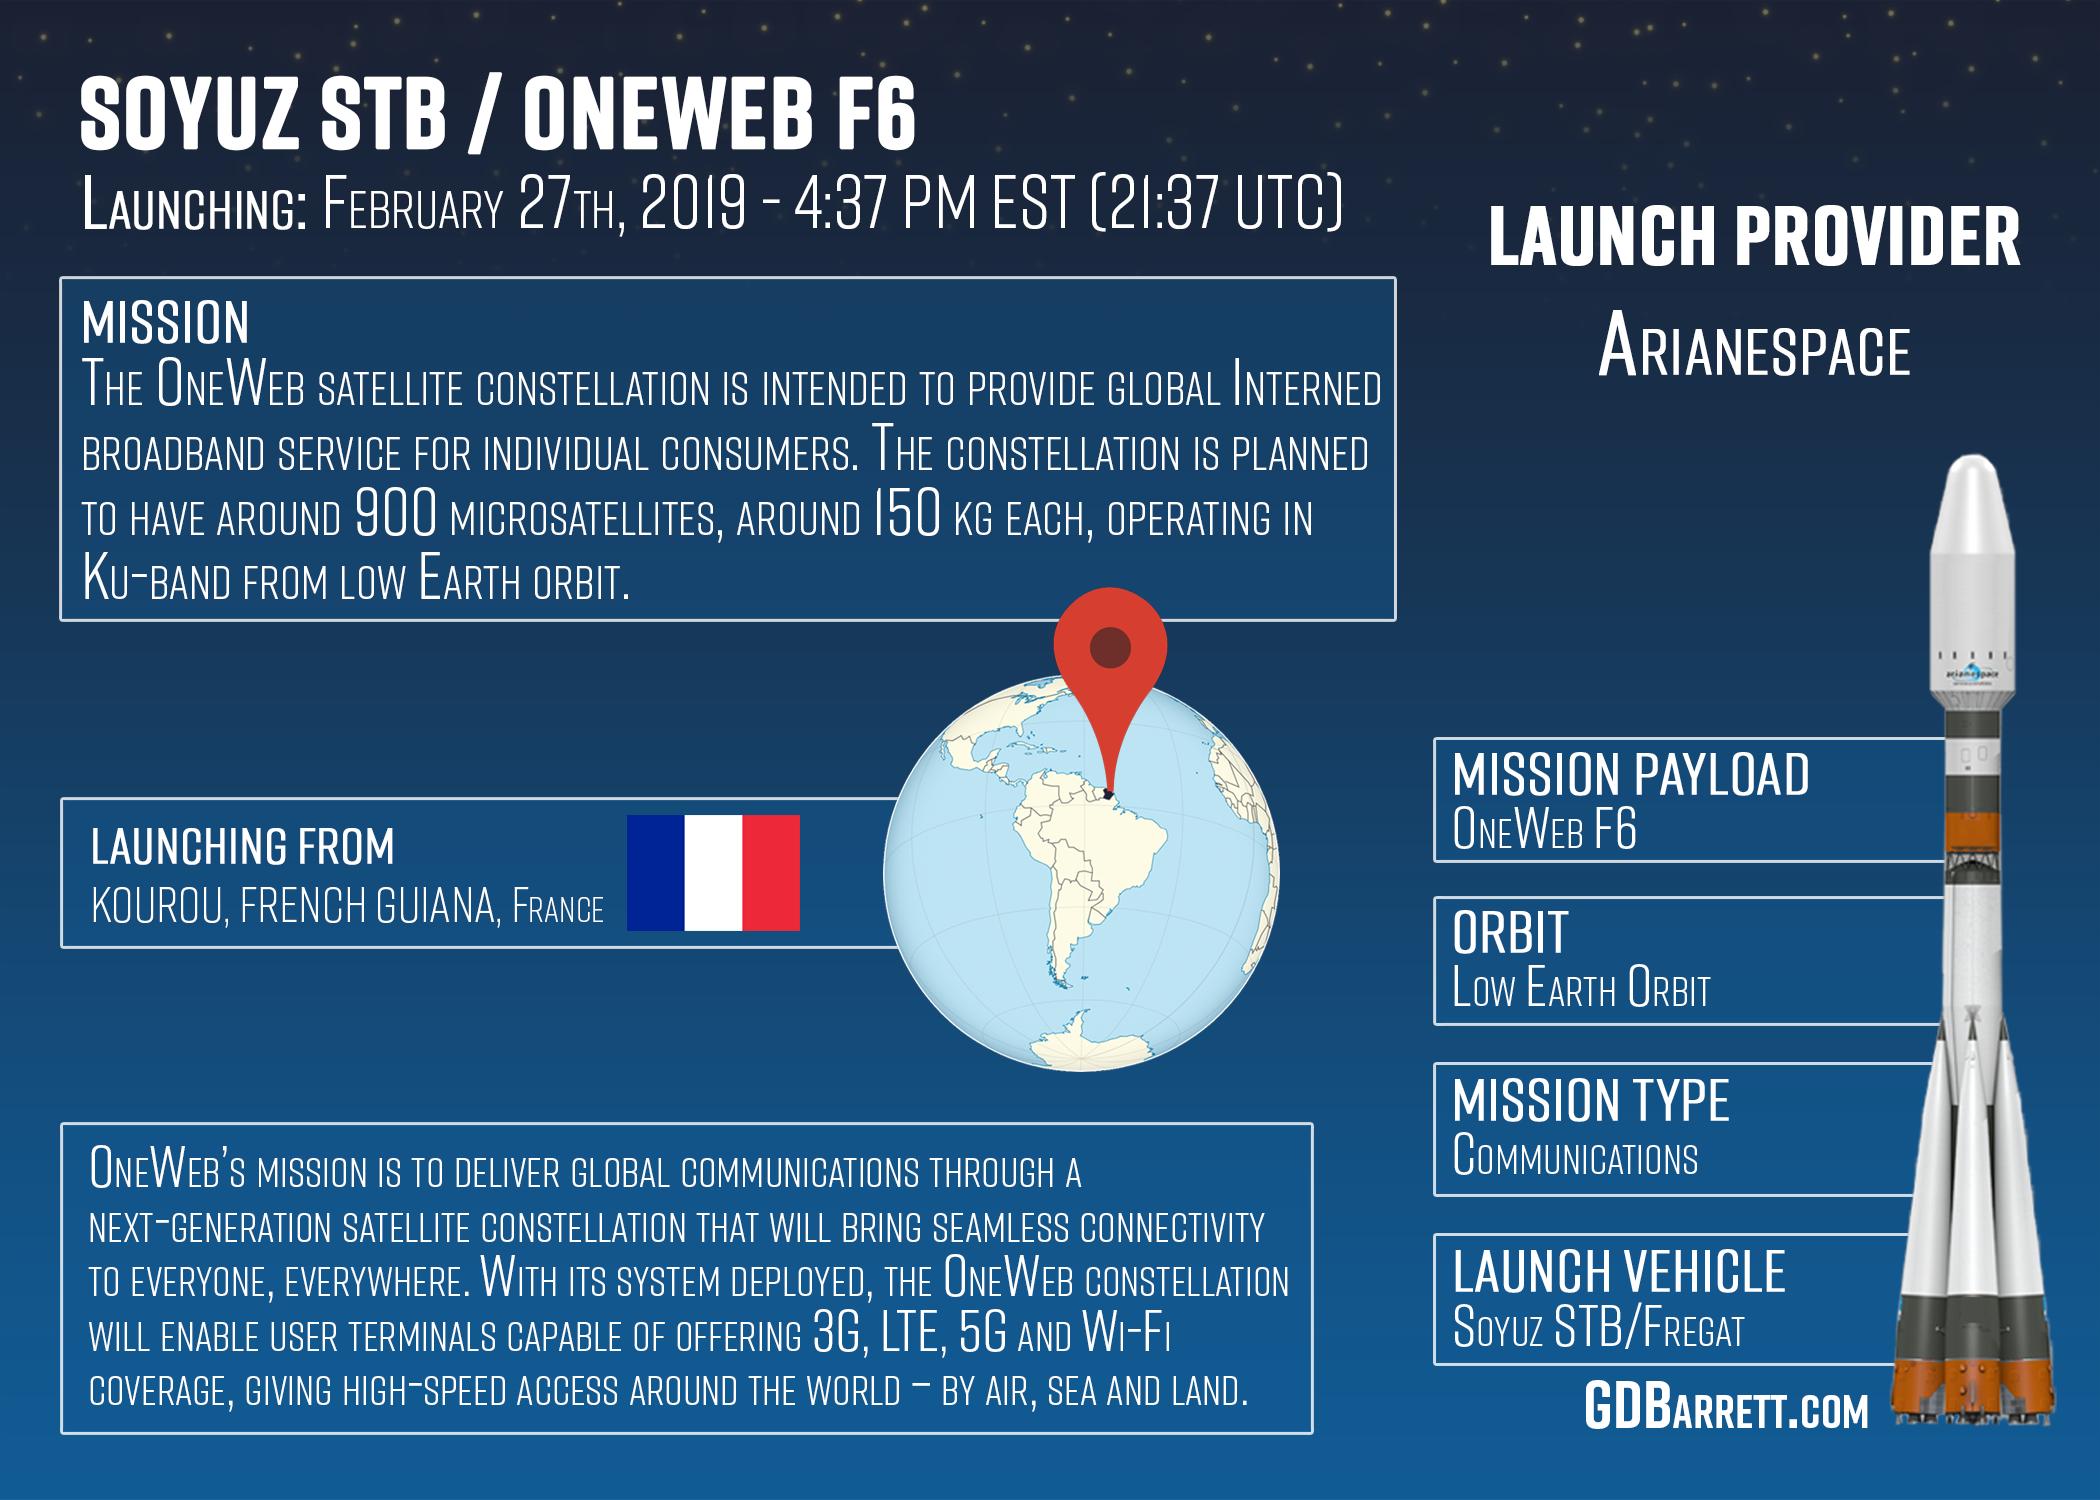 Soyuz STB / OneWeb F6